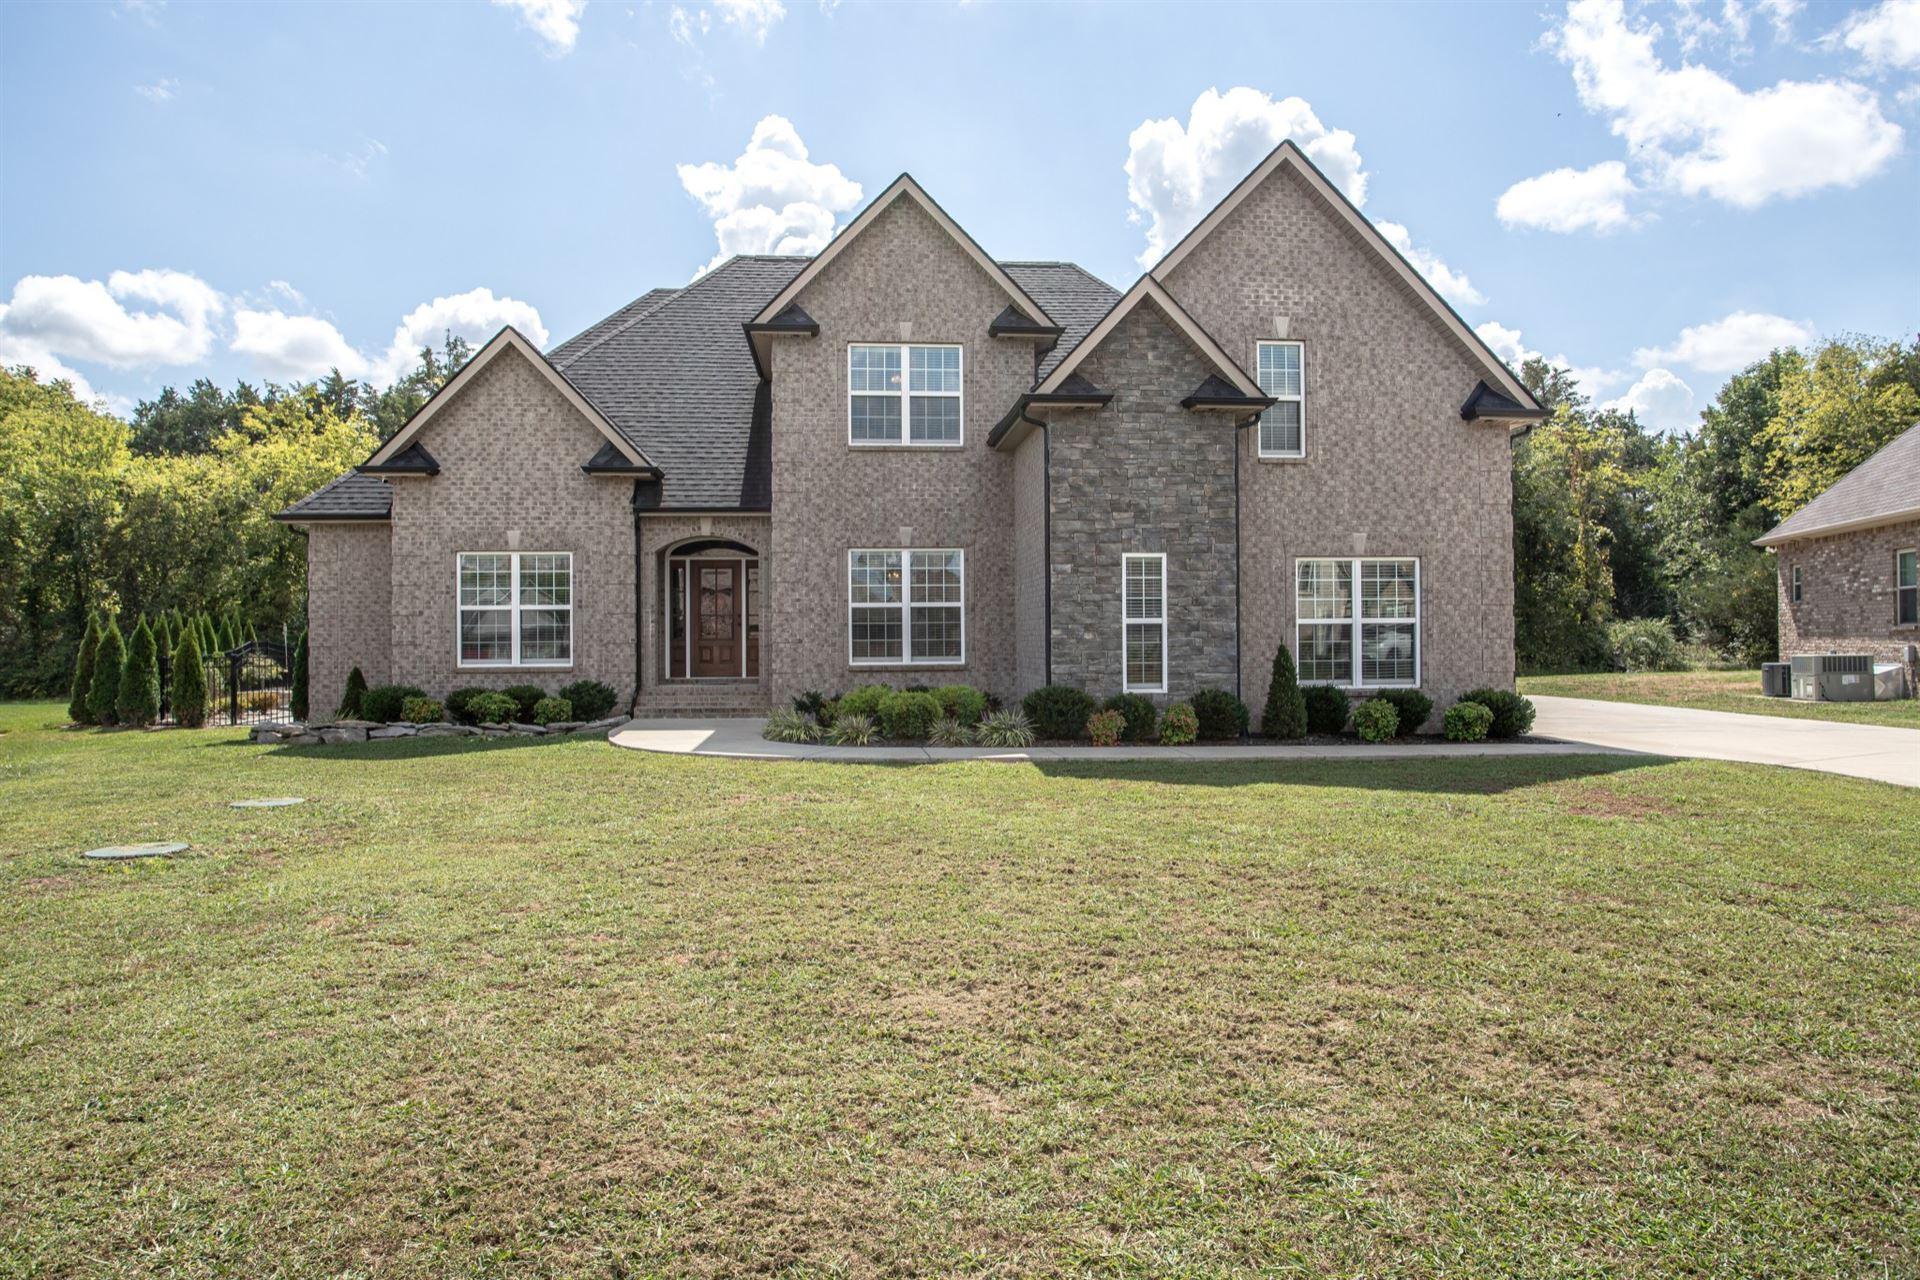 Photo of 3521 Titus Ln, Murfreesboro, TN 37128 (MLS # 2291325)